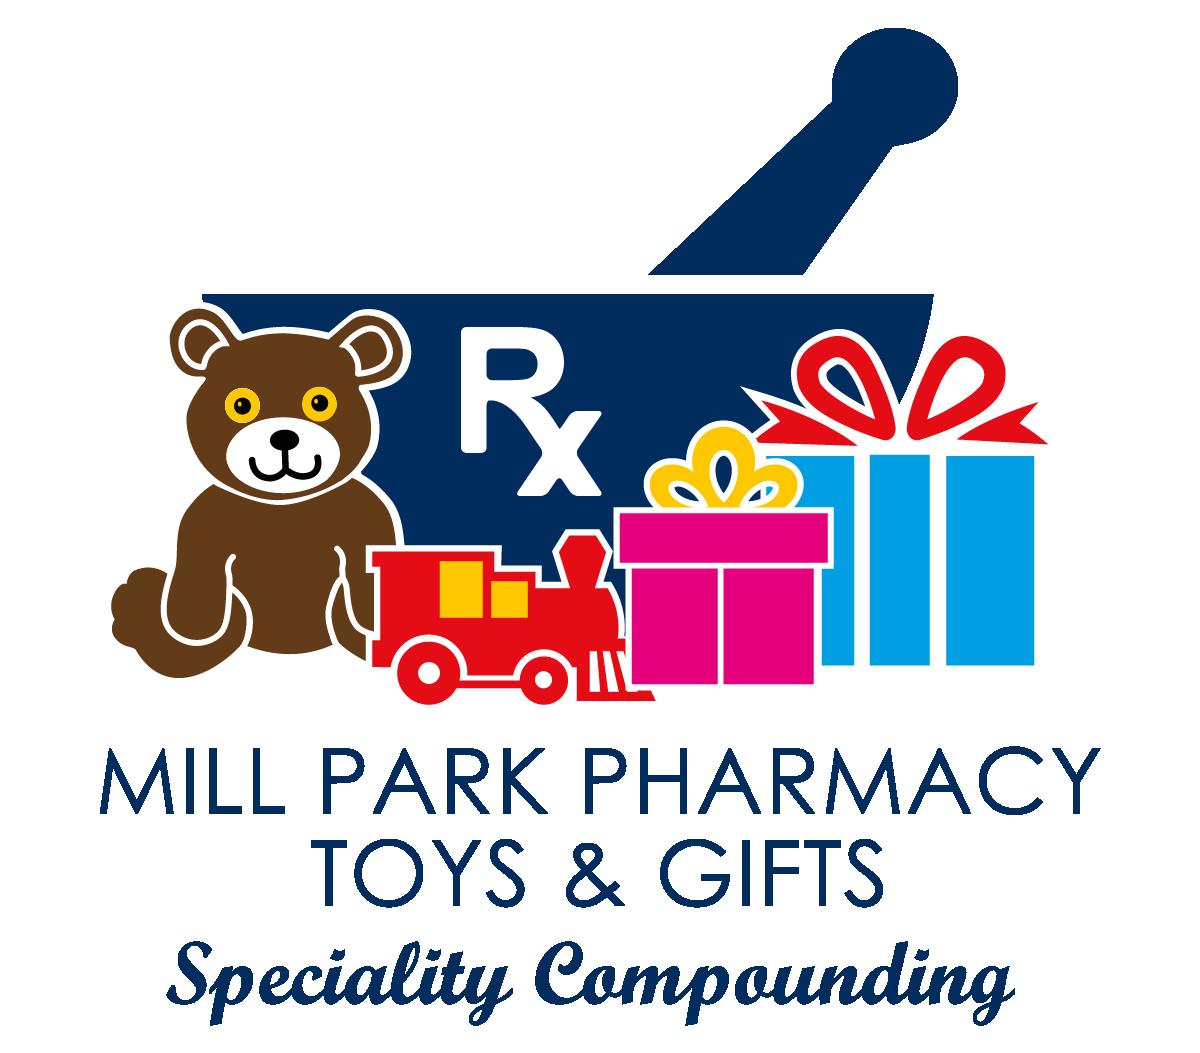 Mill Park Pharmacy